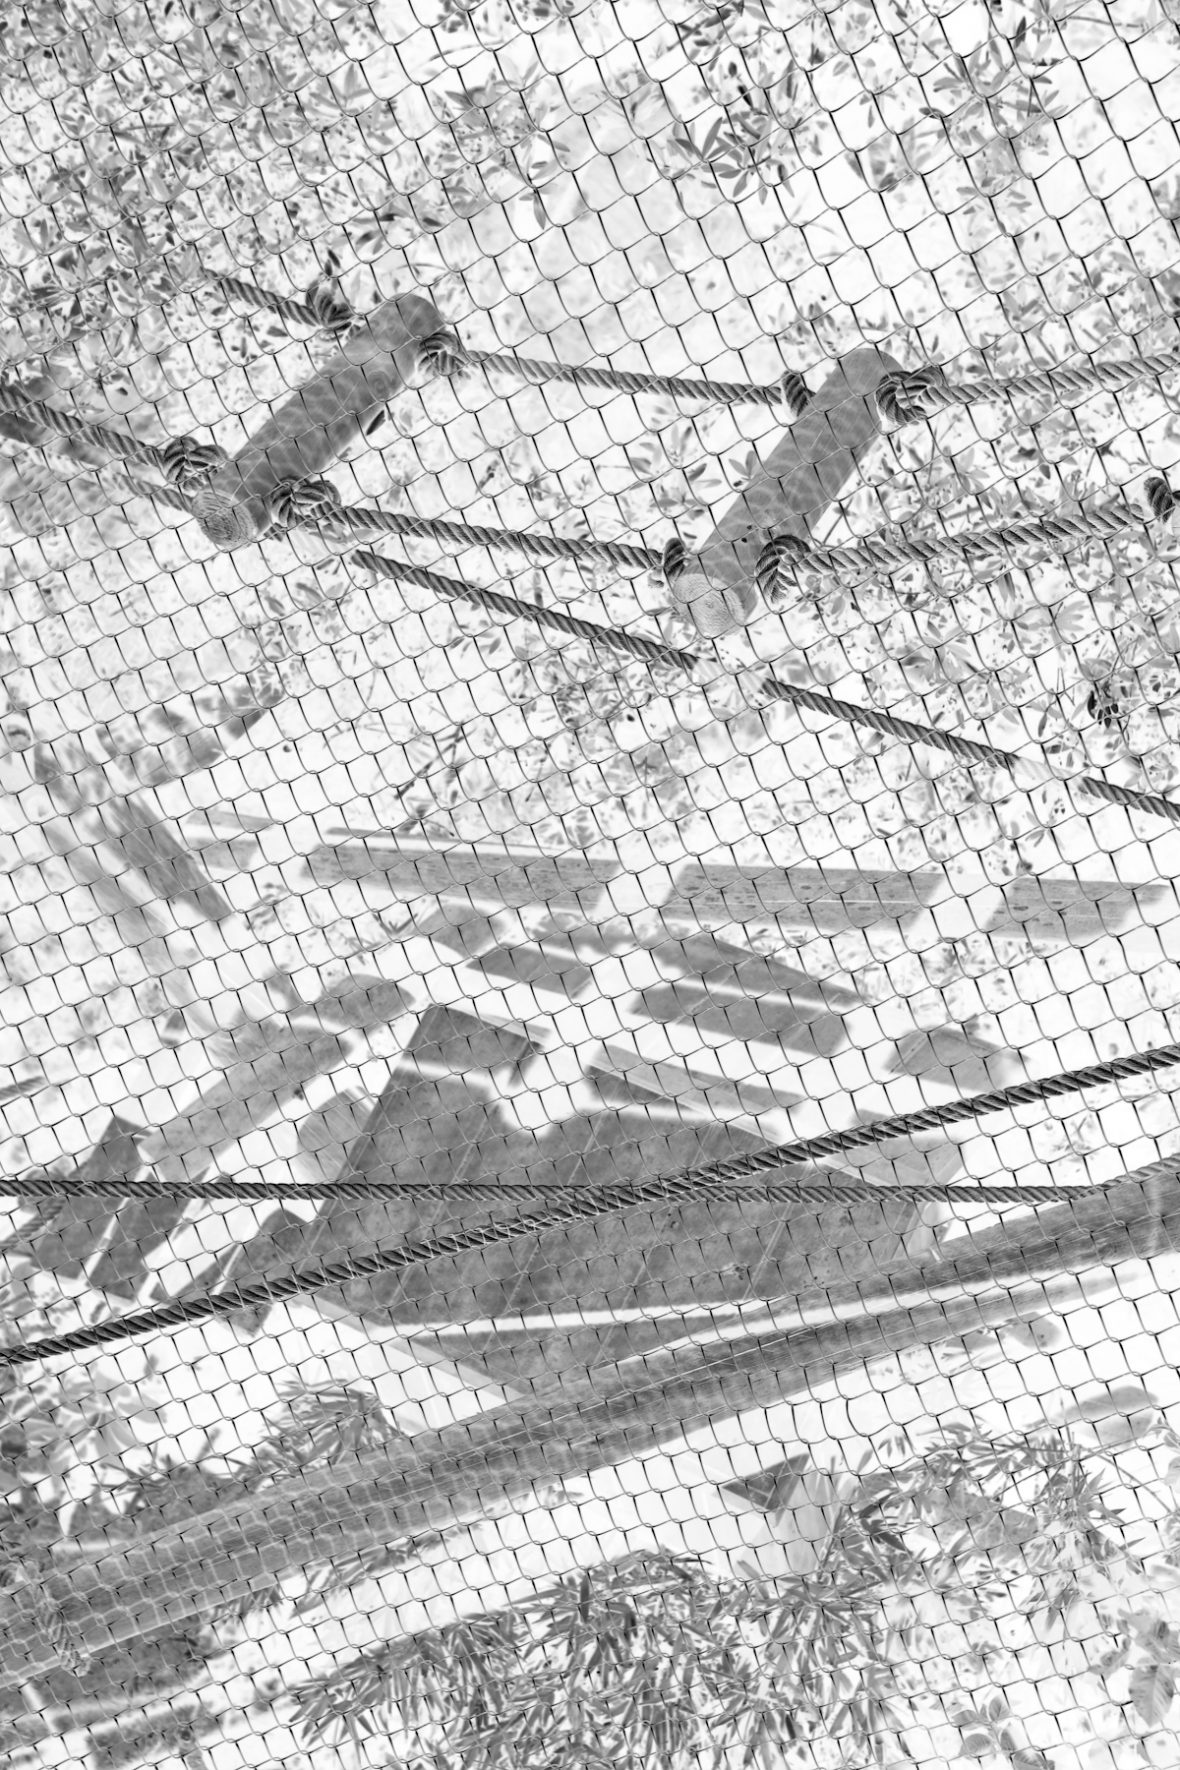 Enclosures, 2011, Pigmentsprint, 90cm x 60cm